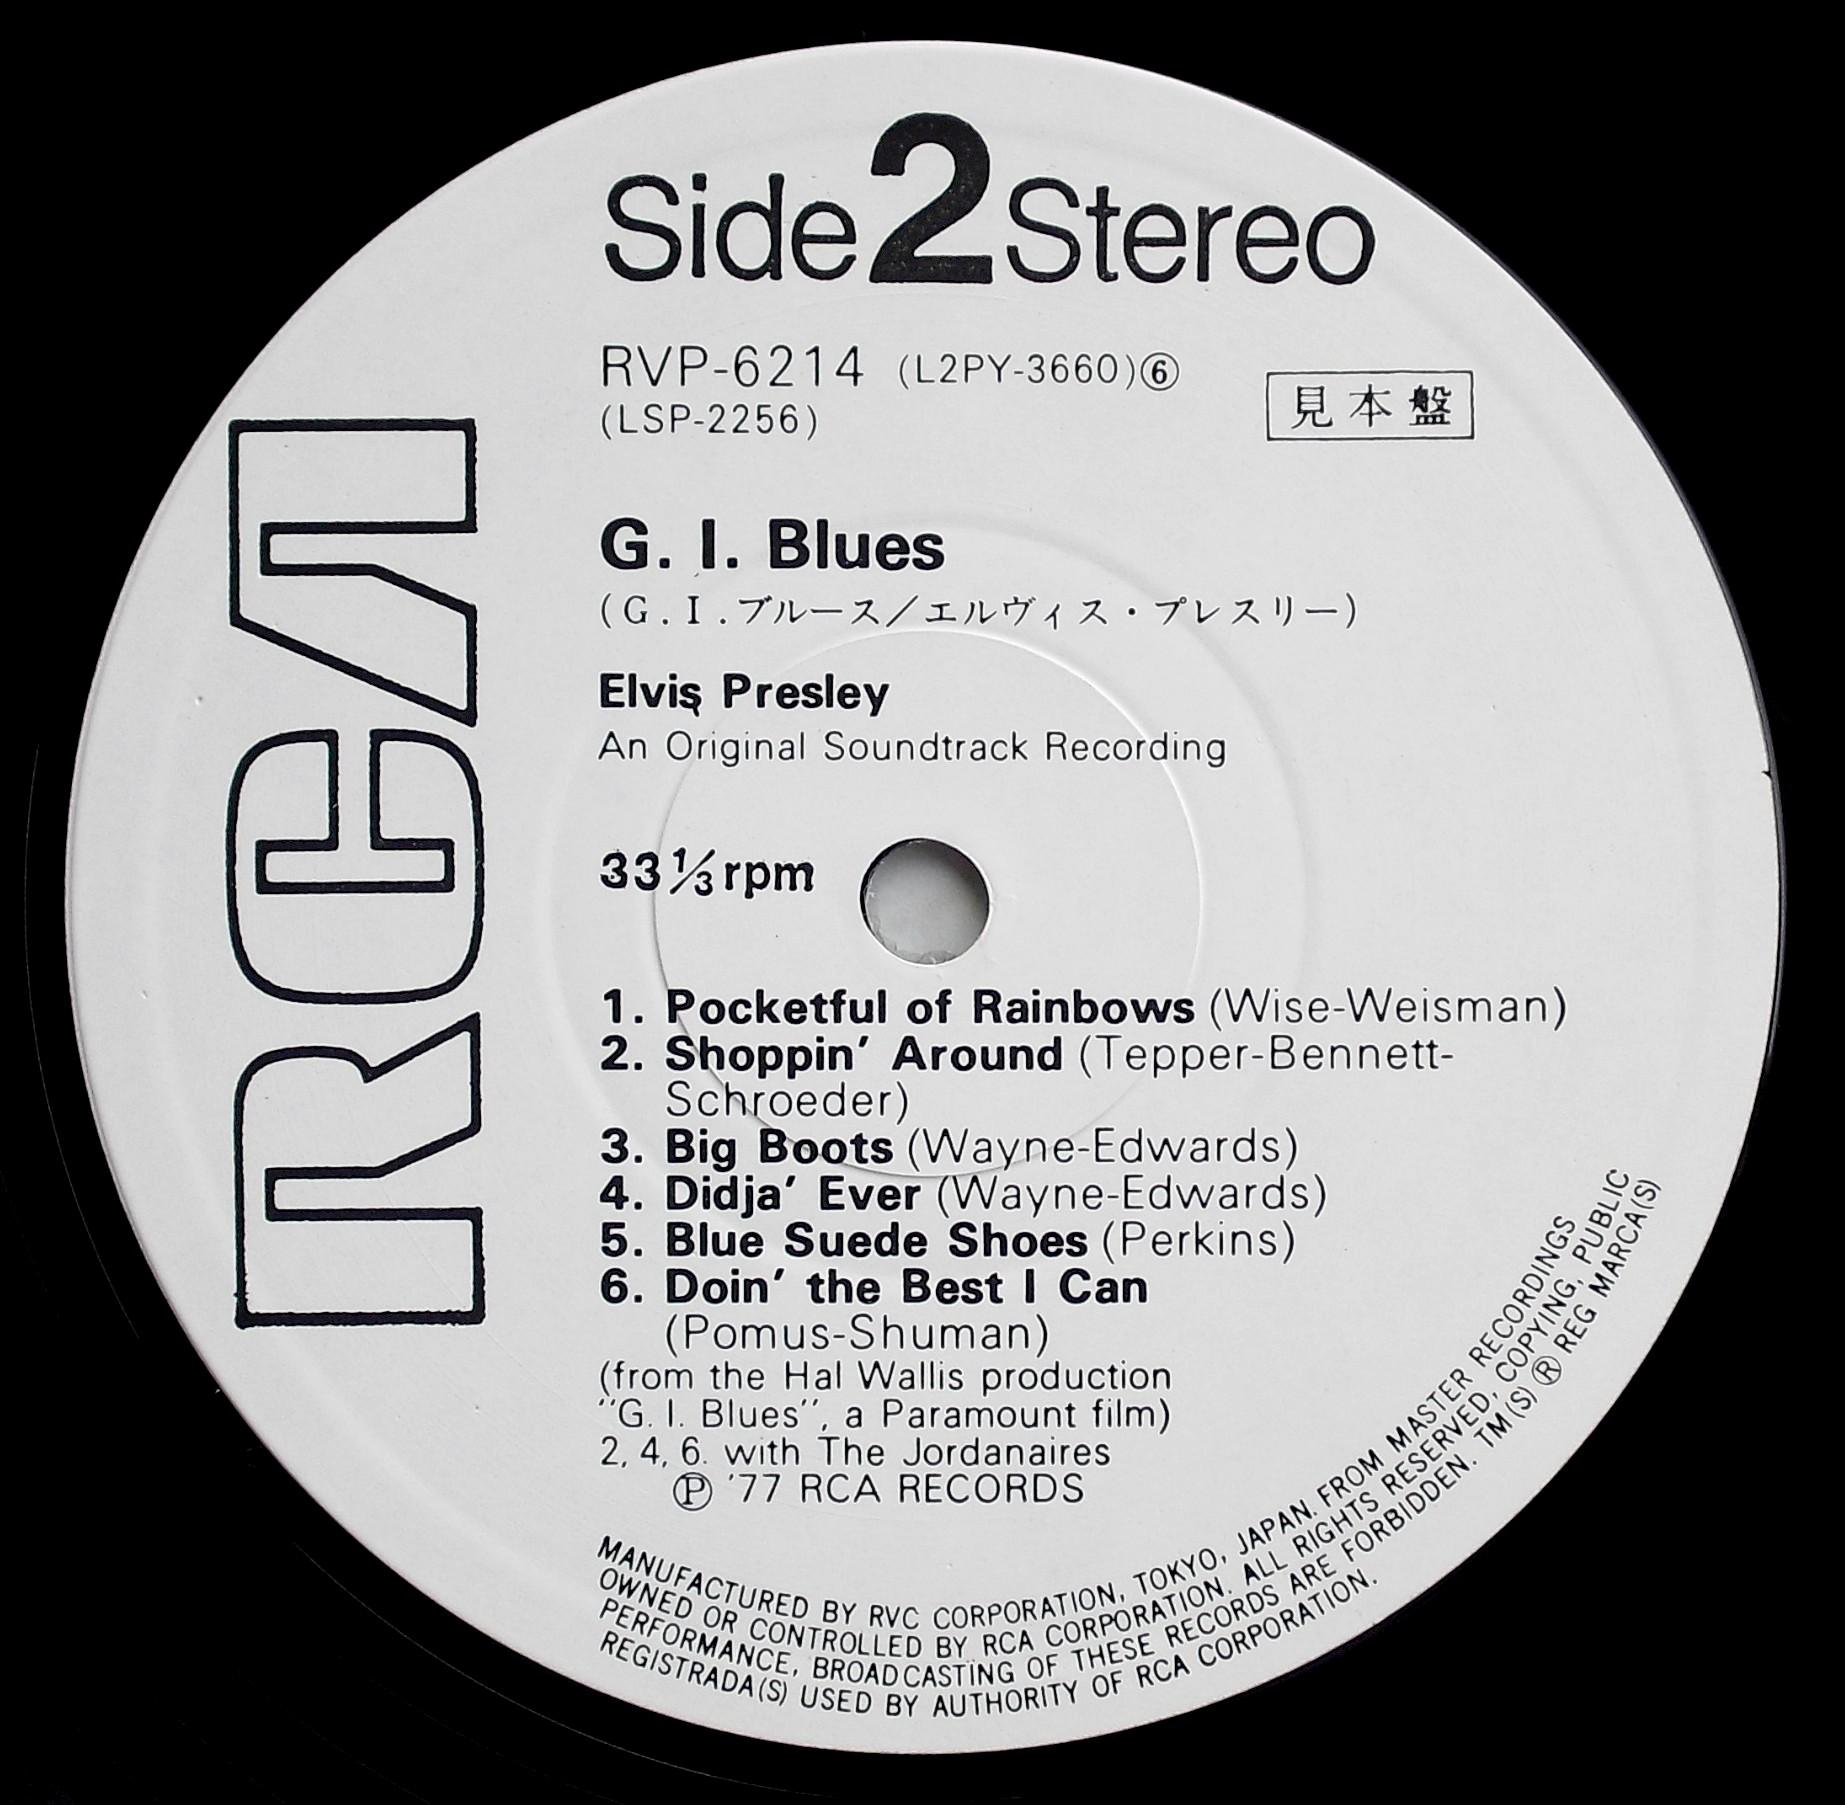 G.I. BLUES 06s2rushp